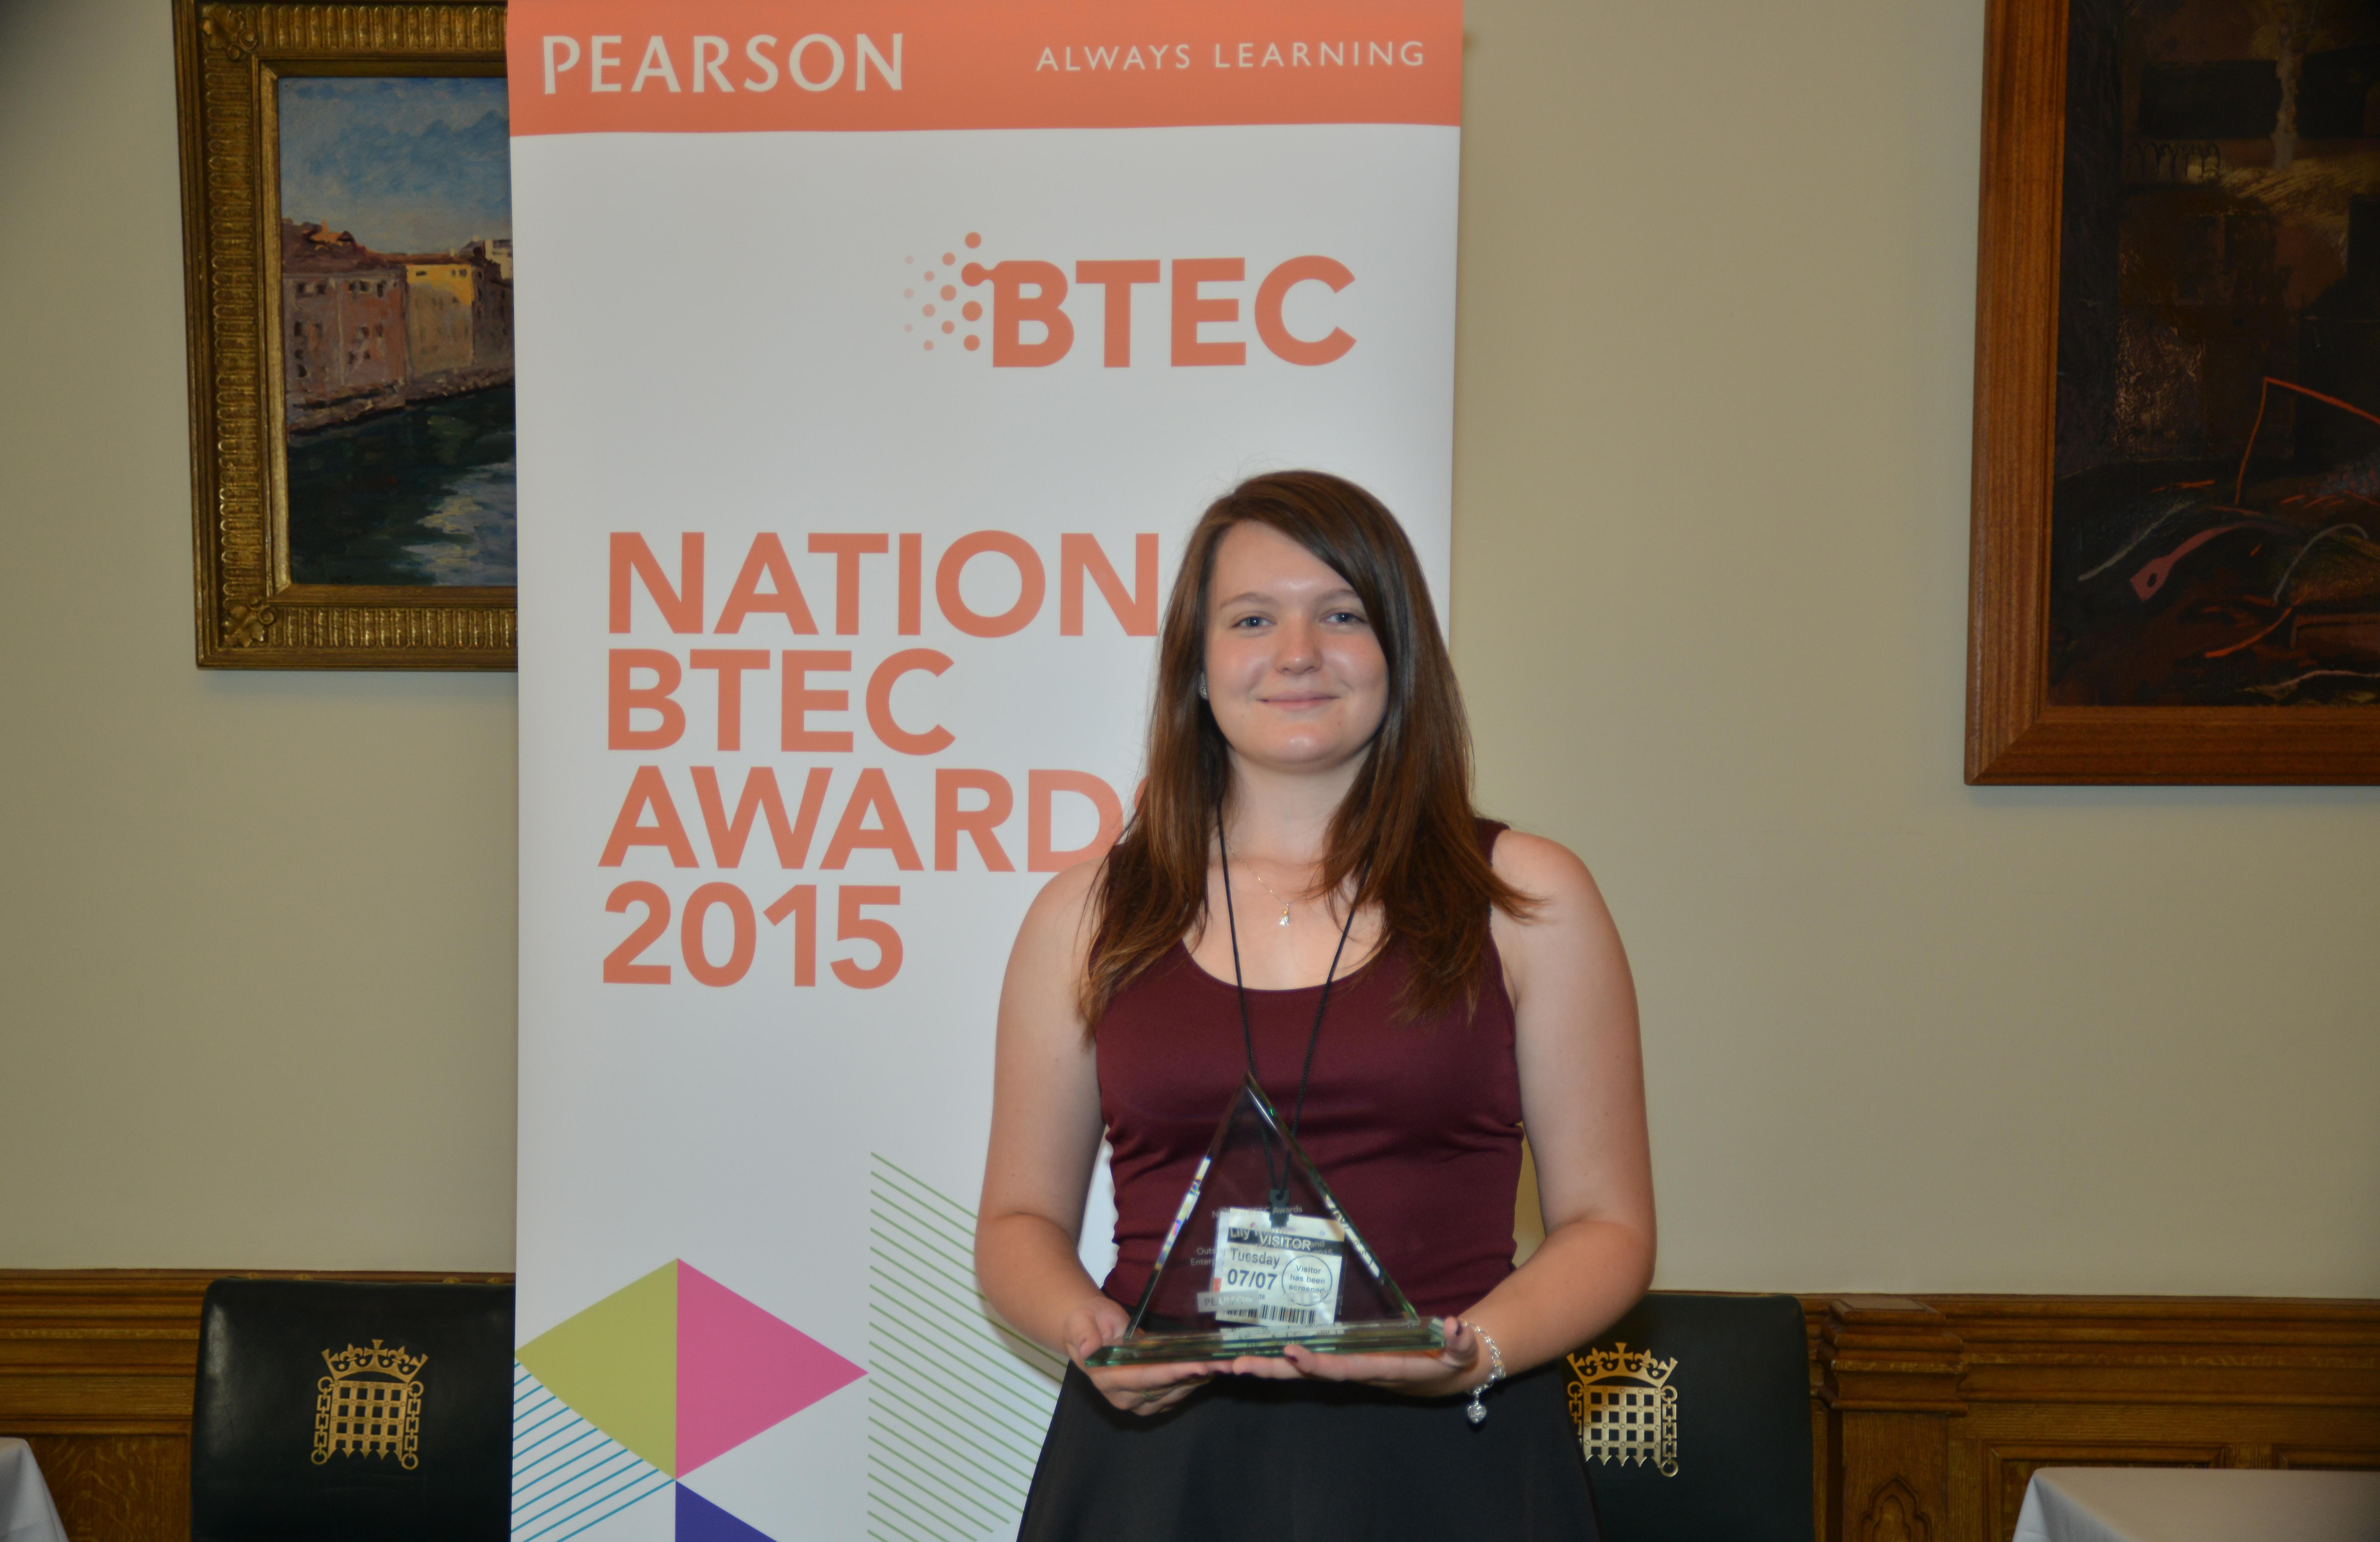 Megan Taylor, aged 19, Nescot College (Epsom)